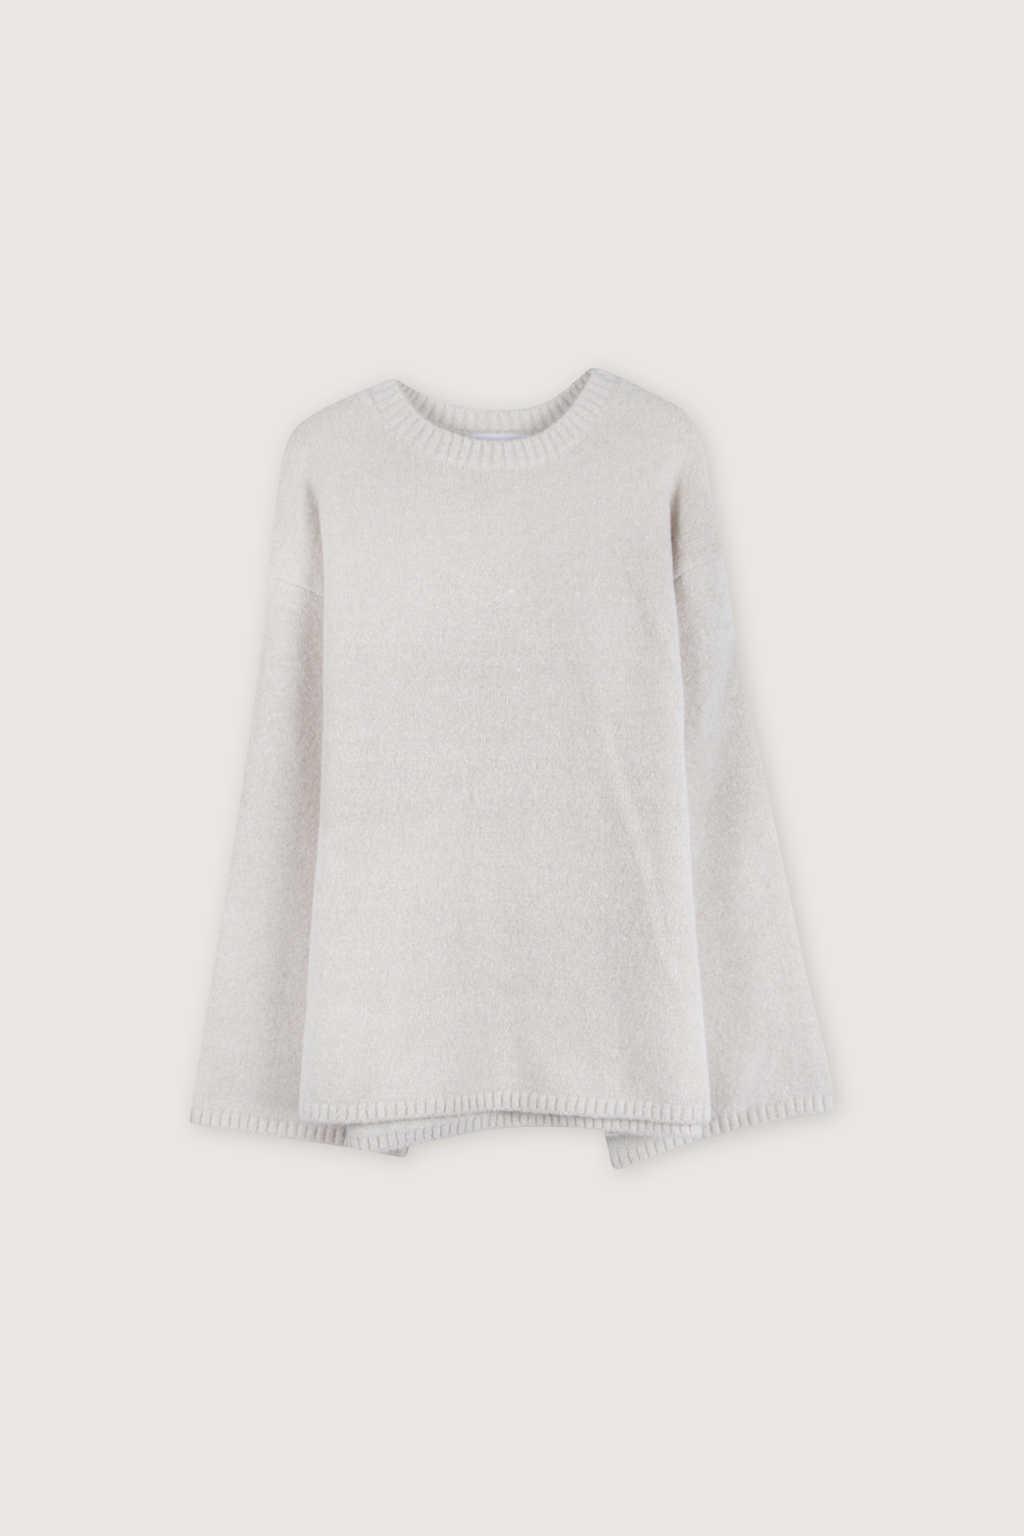 Sweater 1966 Oatmeal 2